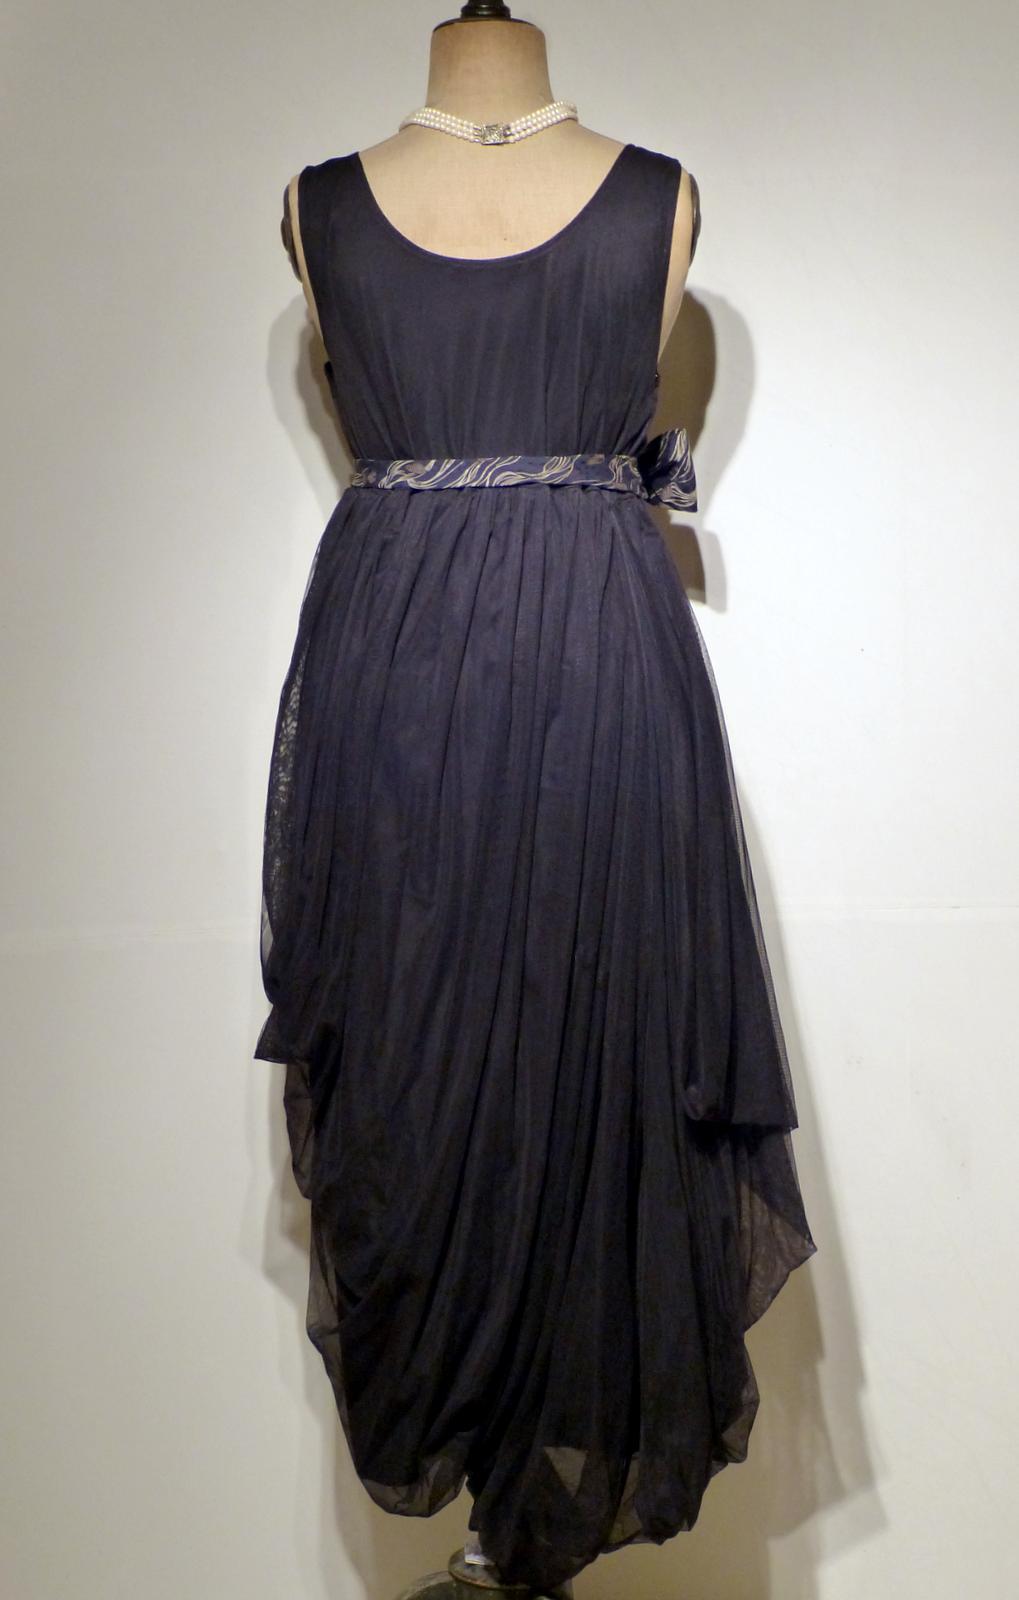 location de robe grande taille olympia location location de robe. Black Bedroom Furniture Sets. Home Design Ideas